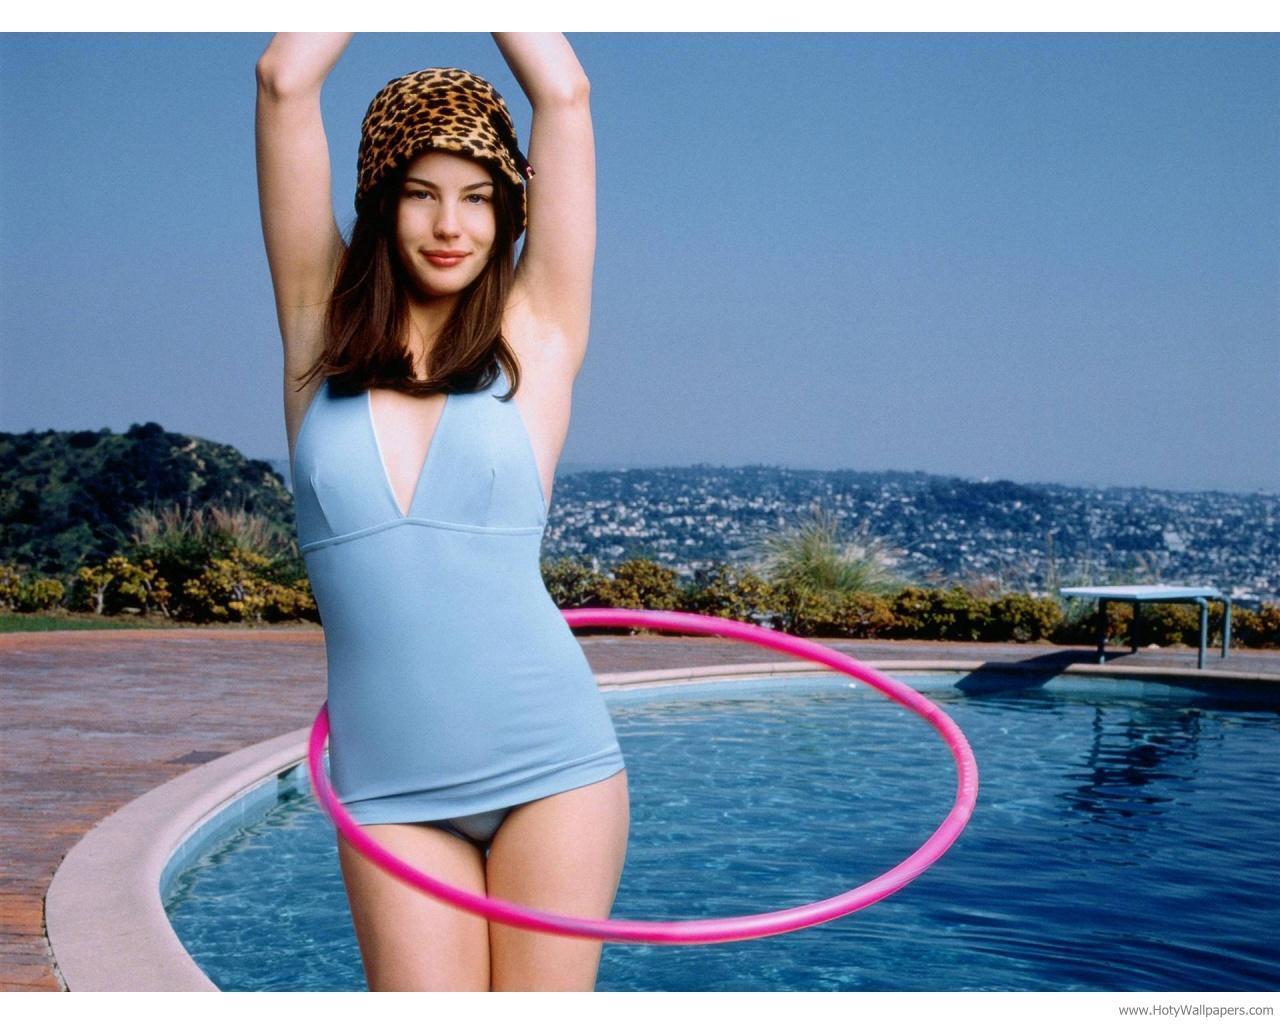 http://4.bp.blogspot.com/-tUvrZ3hPuZQ/Tprfk9uMuvI/AAAAAAAAL6o/lNtdXeefqzE/s1600/liv_tyler_bikini_wallpaper.jpg